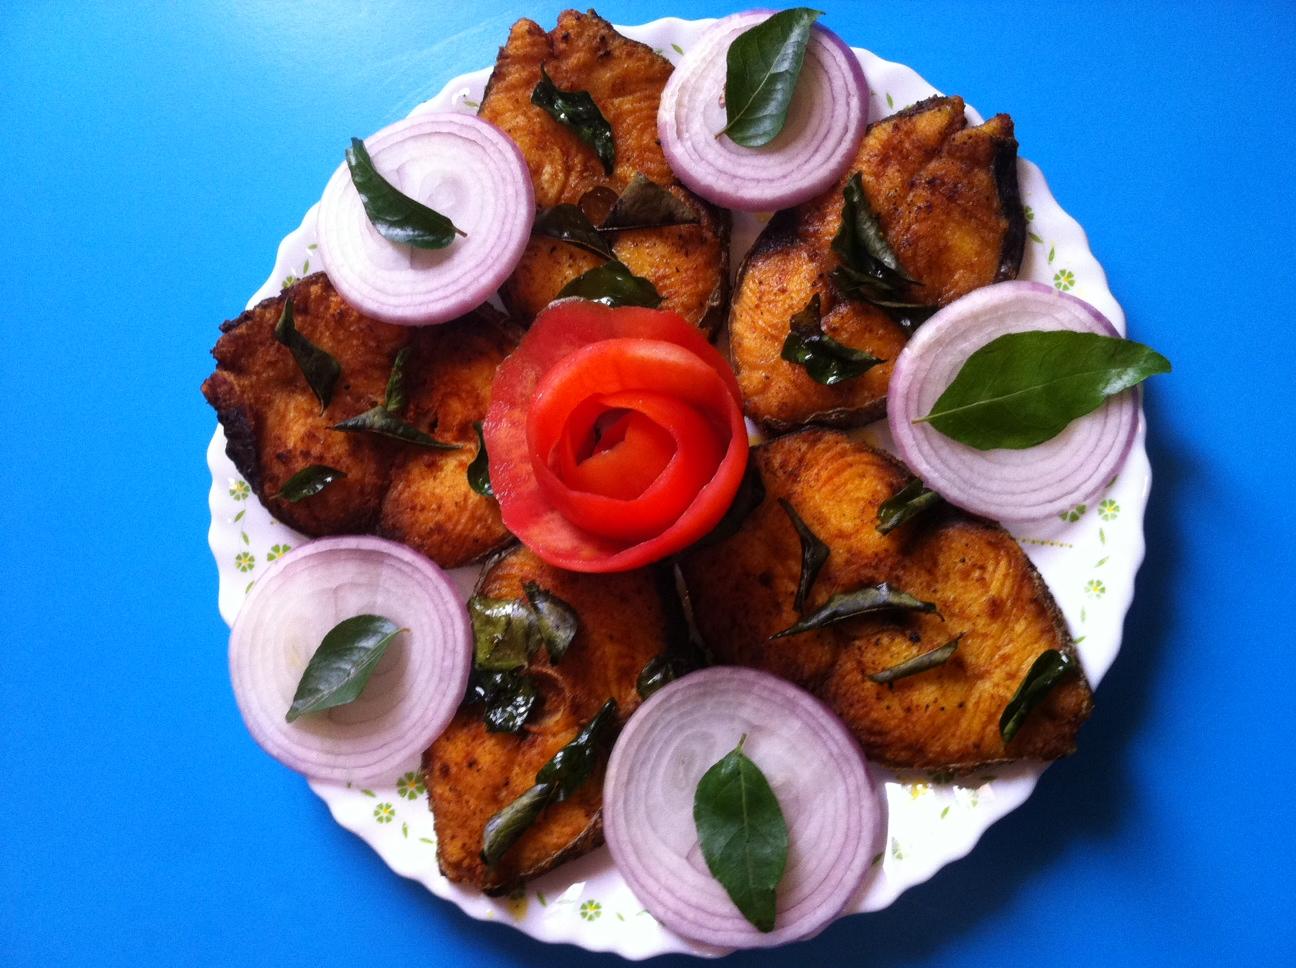 King fish fry recipe kerala style fish fry for King fish recipe